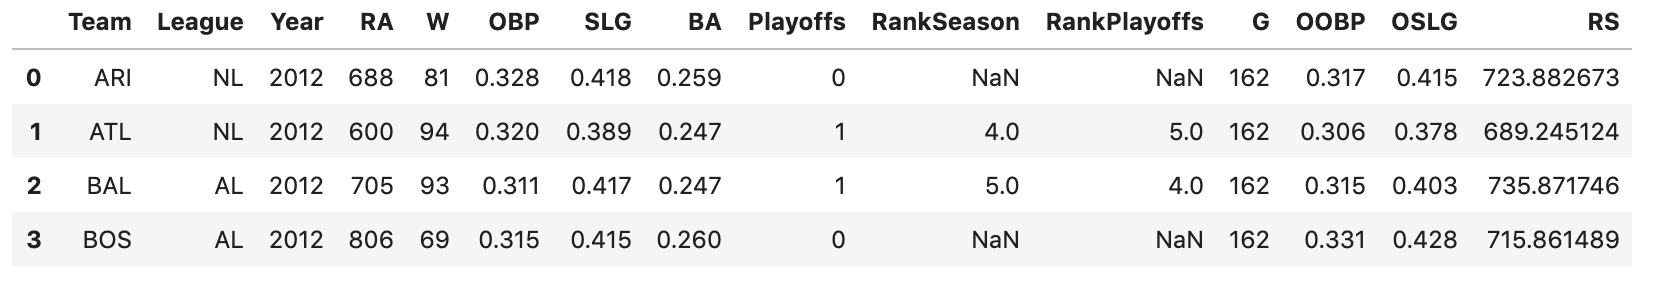 baseball predicted dataset